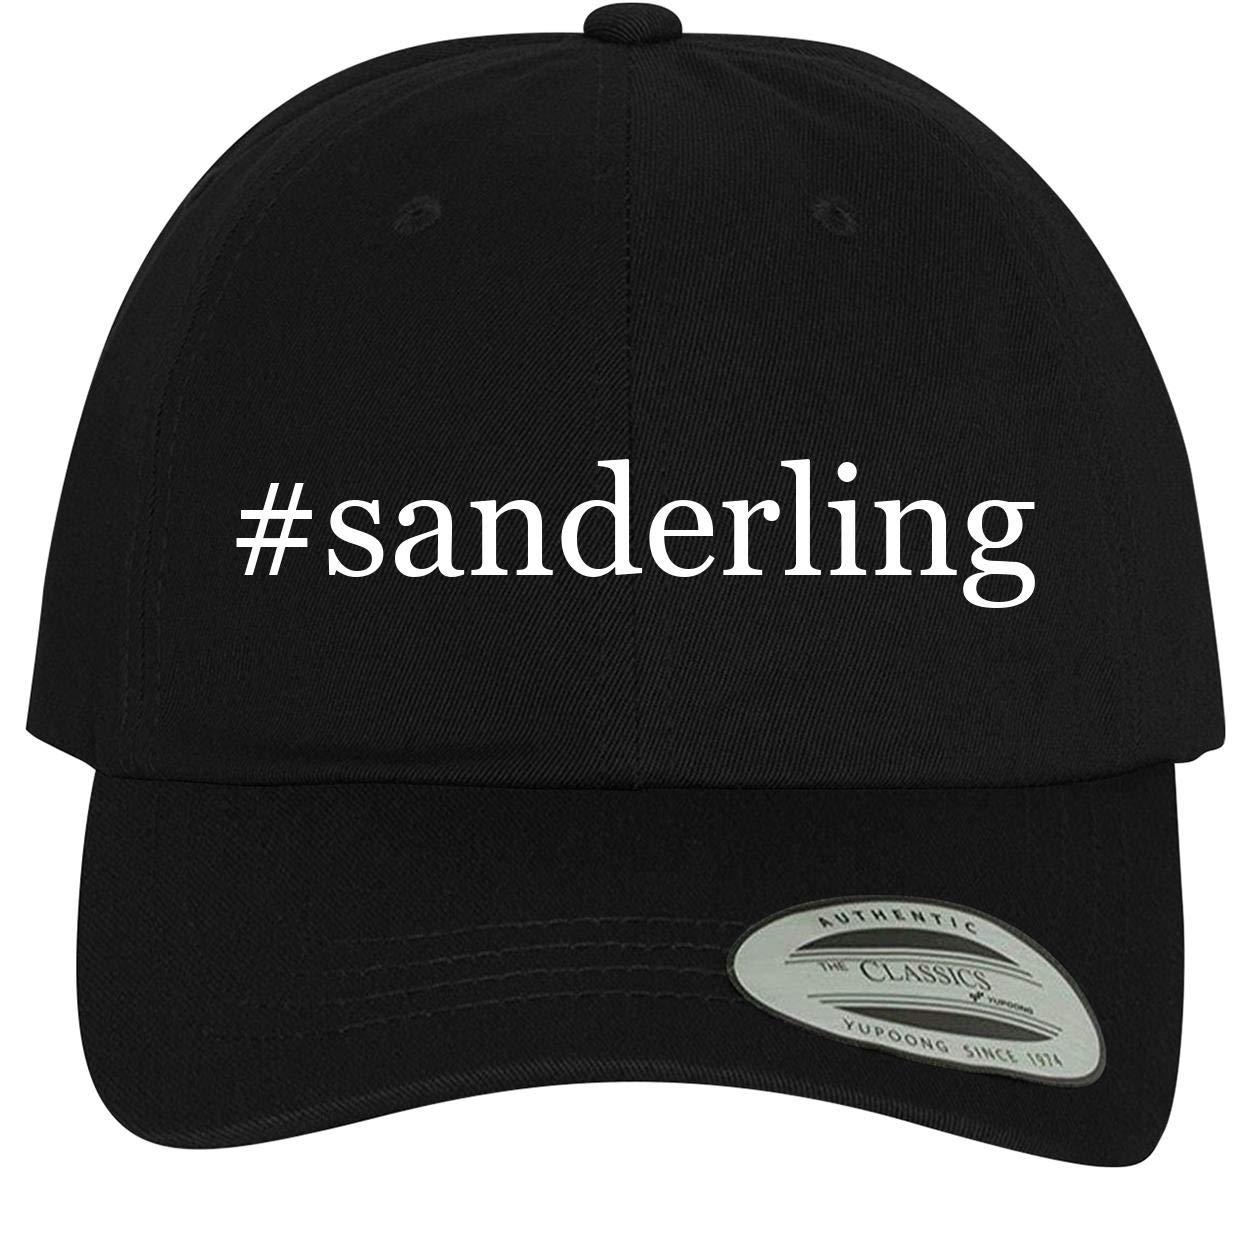 Comfortable Dad Hat Baseball Cap BH Cool Designs #Sanderling